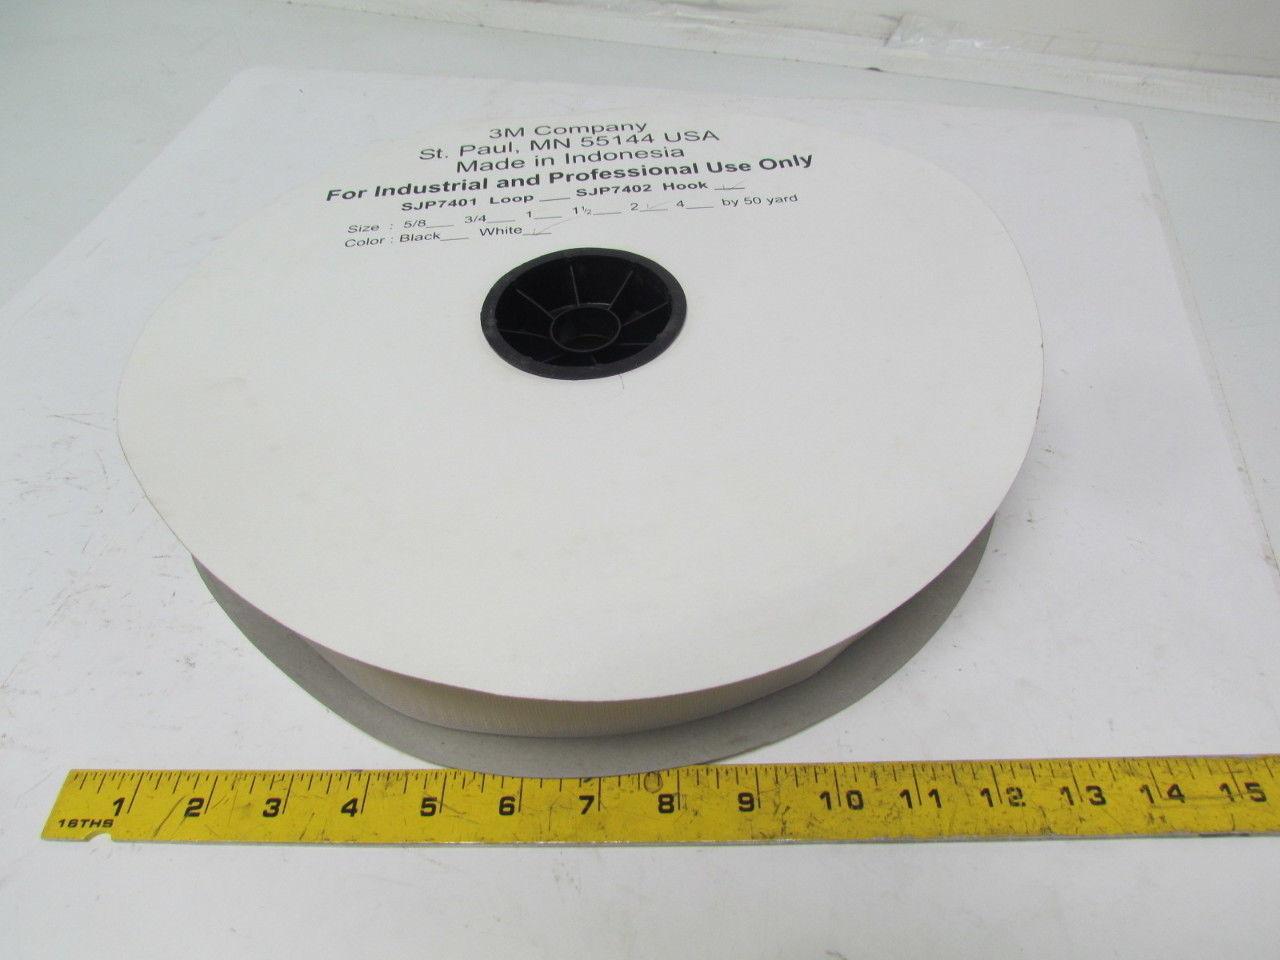 "3M SJP7402 Hook 2""x50 Yards hook side type fastener white sew on"